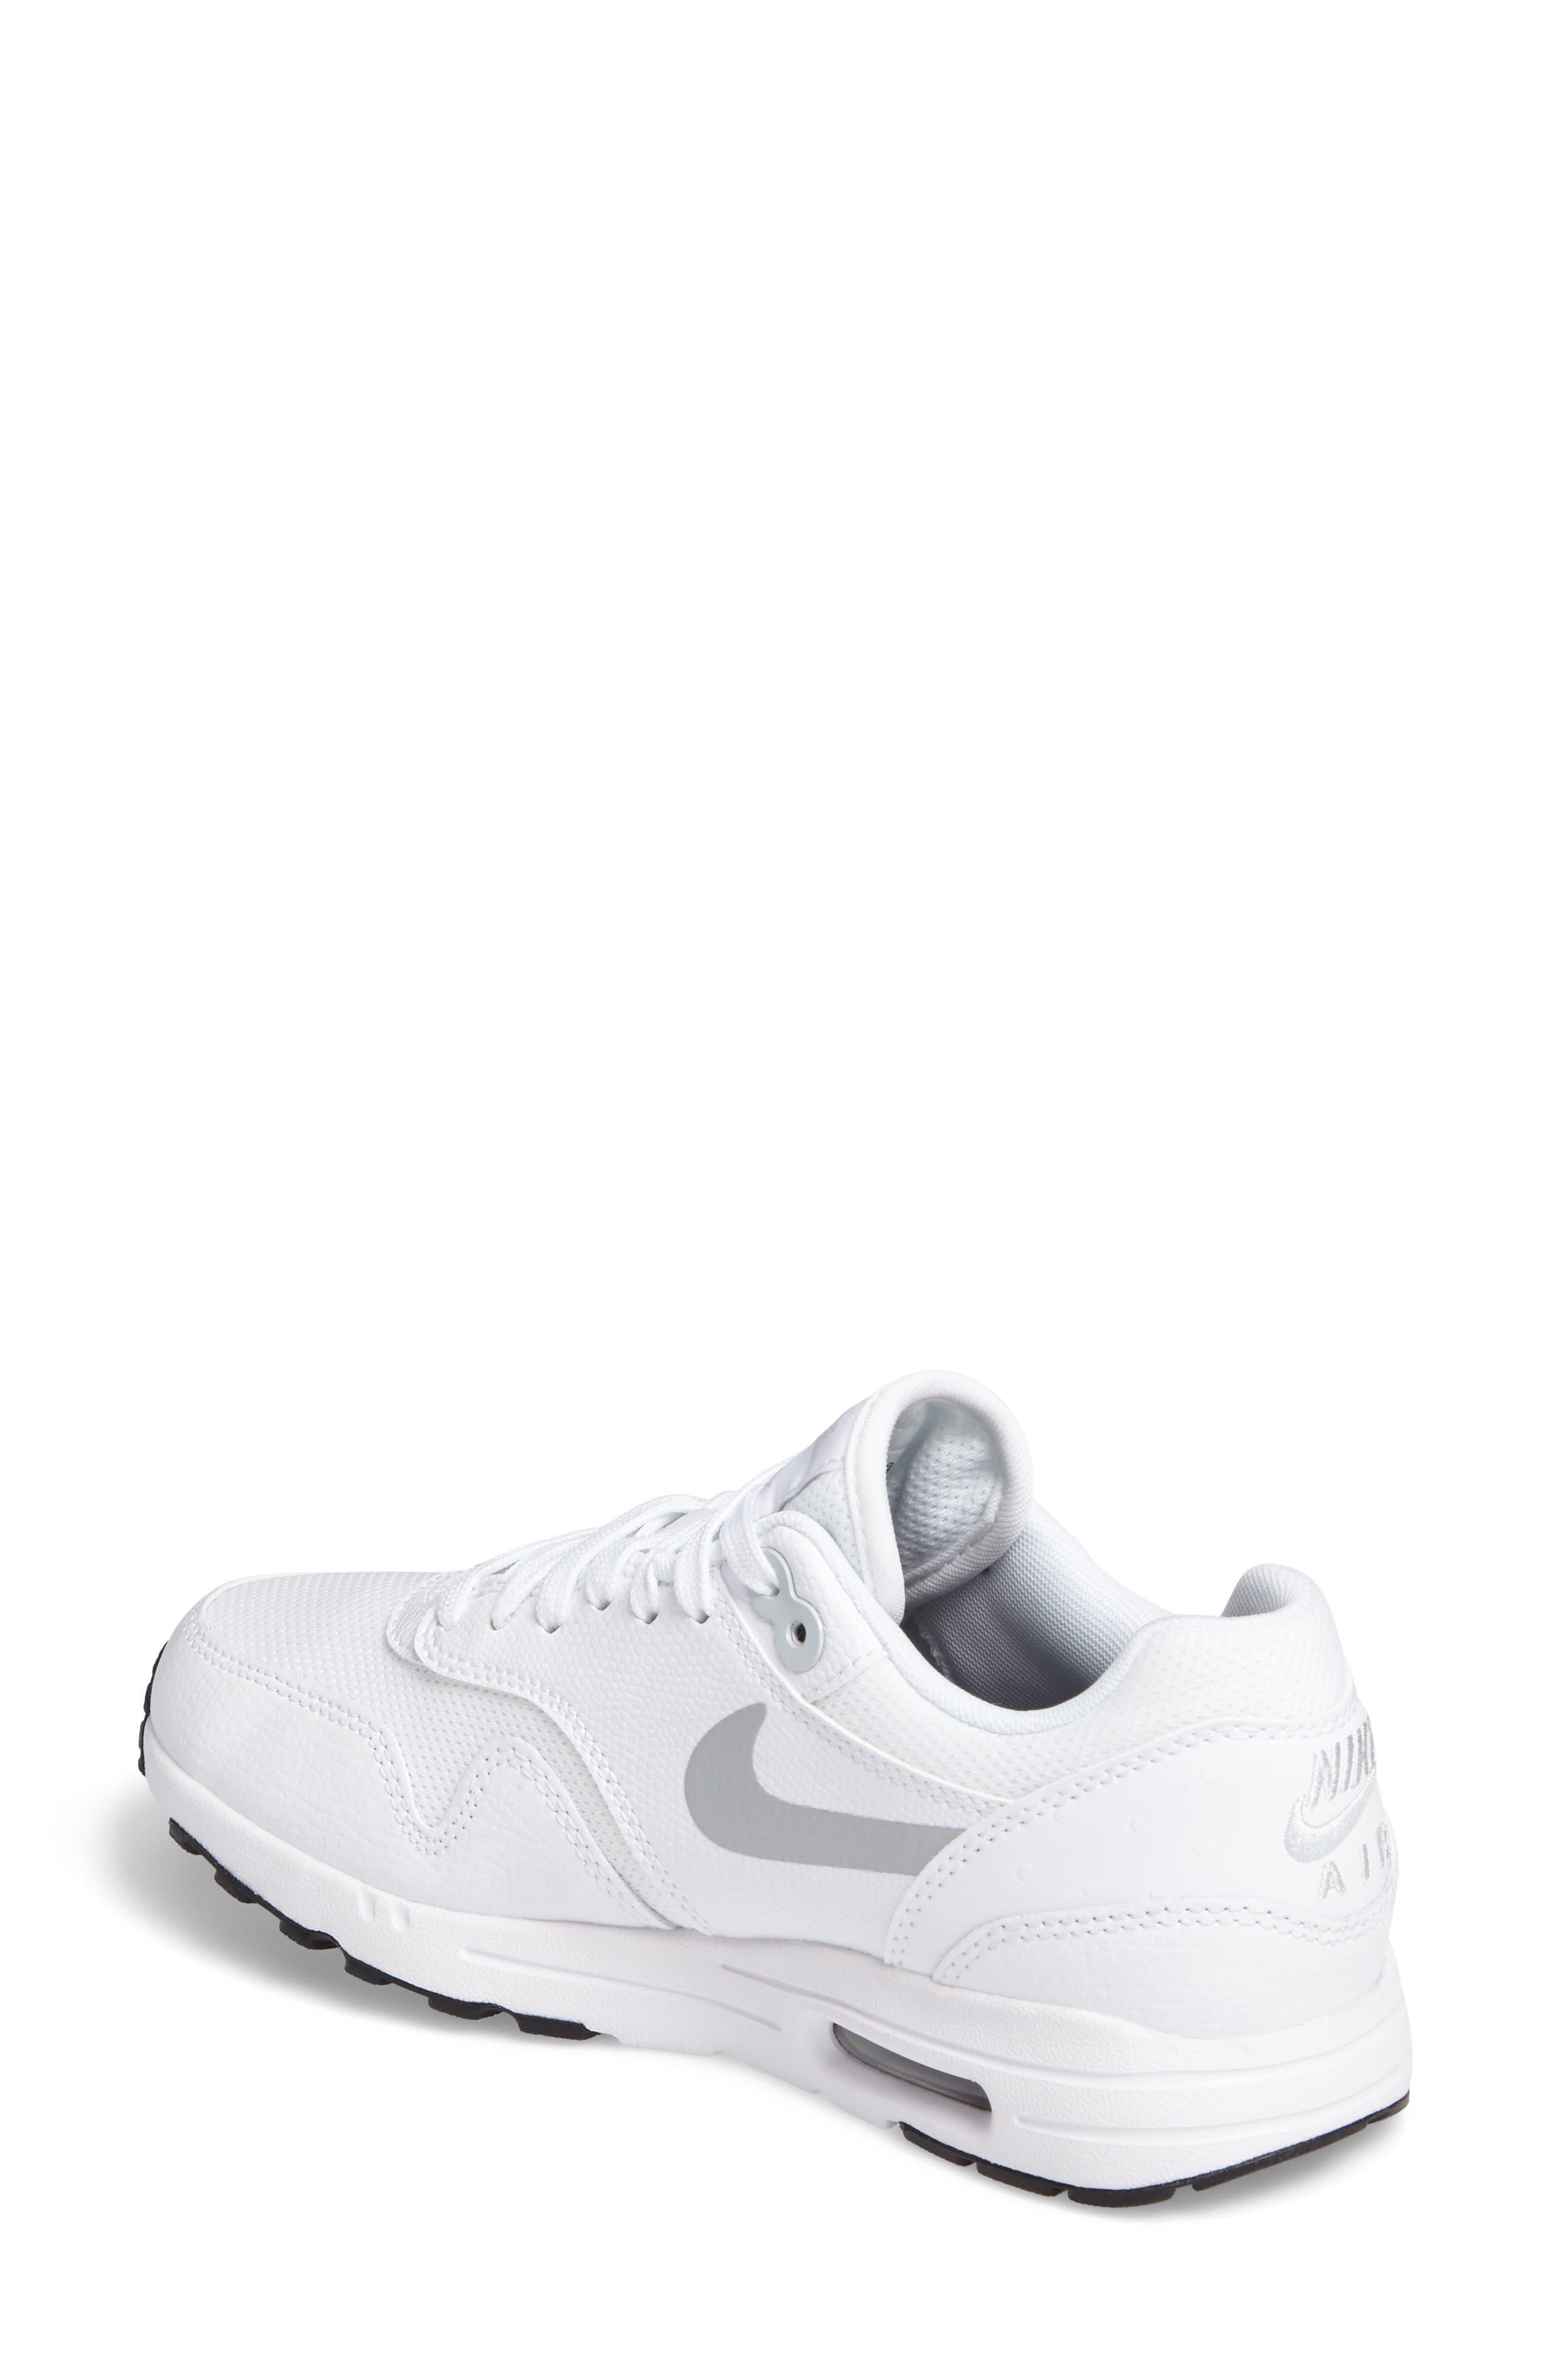 Air Max 1 Ultra 2.0 Running Shoe,                             Alternate thumbnail 2, color,                             White/ Platinum/ Black/ White